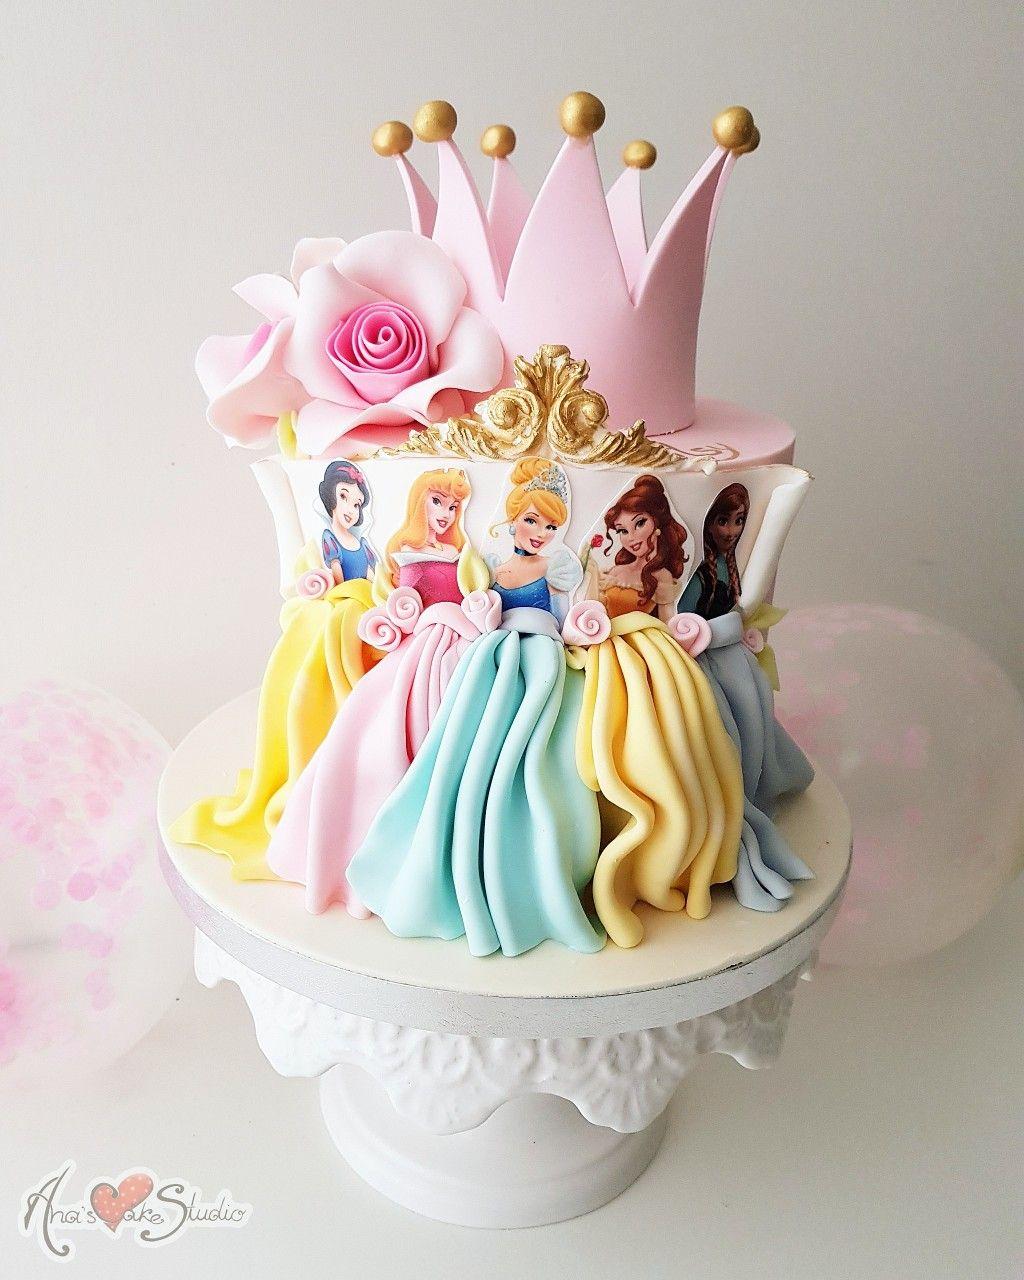 Pin By Christine Ross On Princess Birthday Cake In 2020 Princess